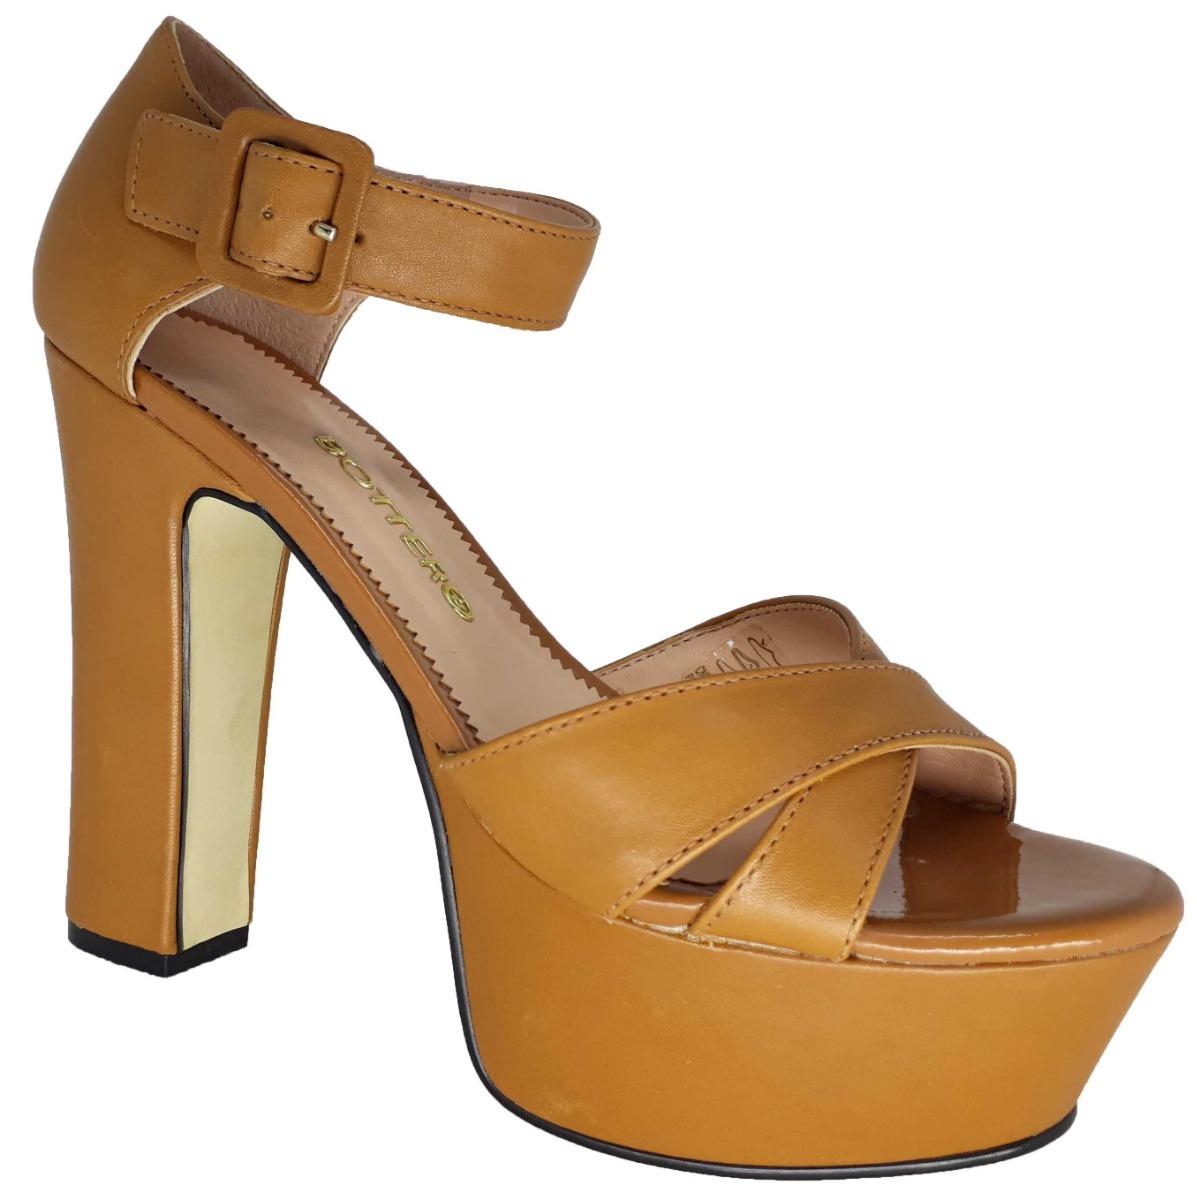 d2c65e80a0 sandalia feminina salto alto meia pata couro bottero 36% off. Carregando  zoom.